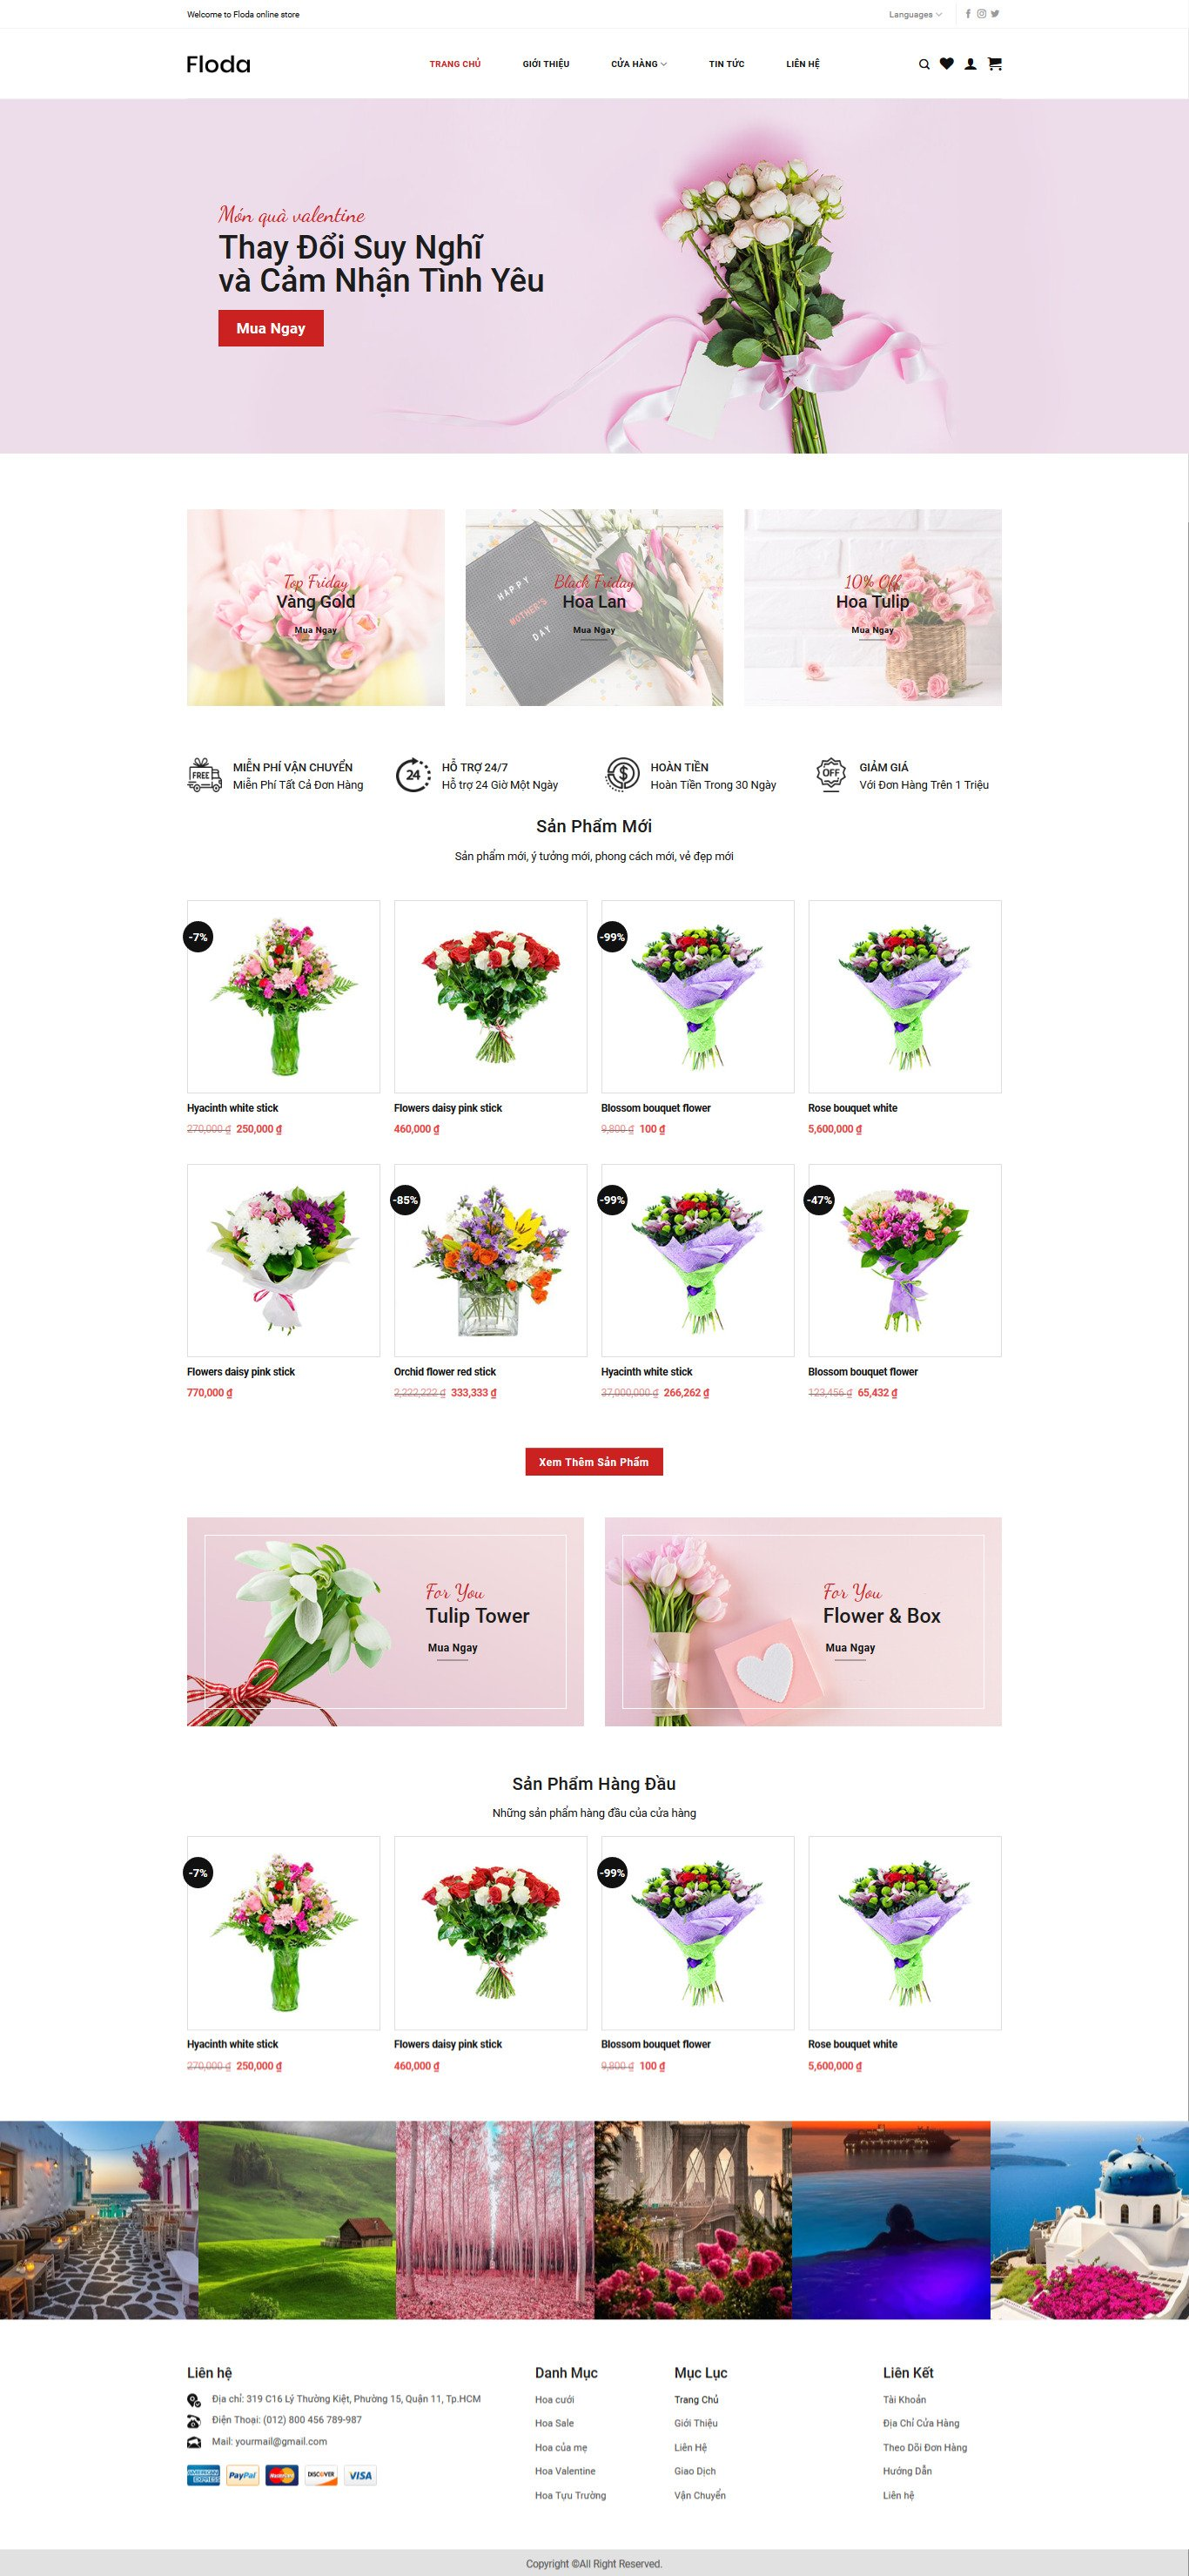 Mẫu website bán hoa giao diện tương tự Floda